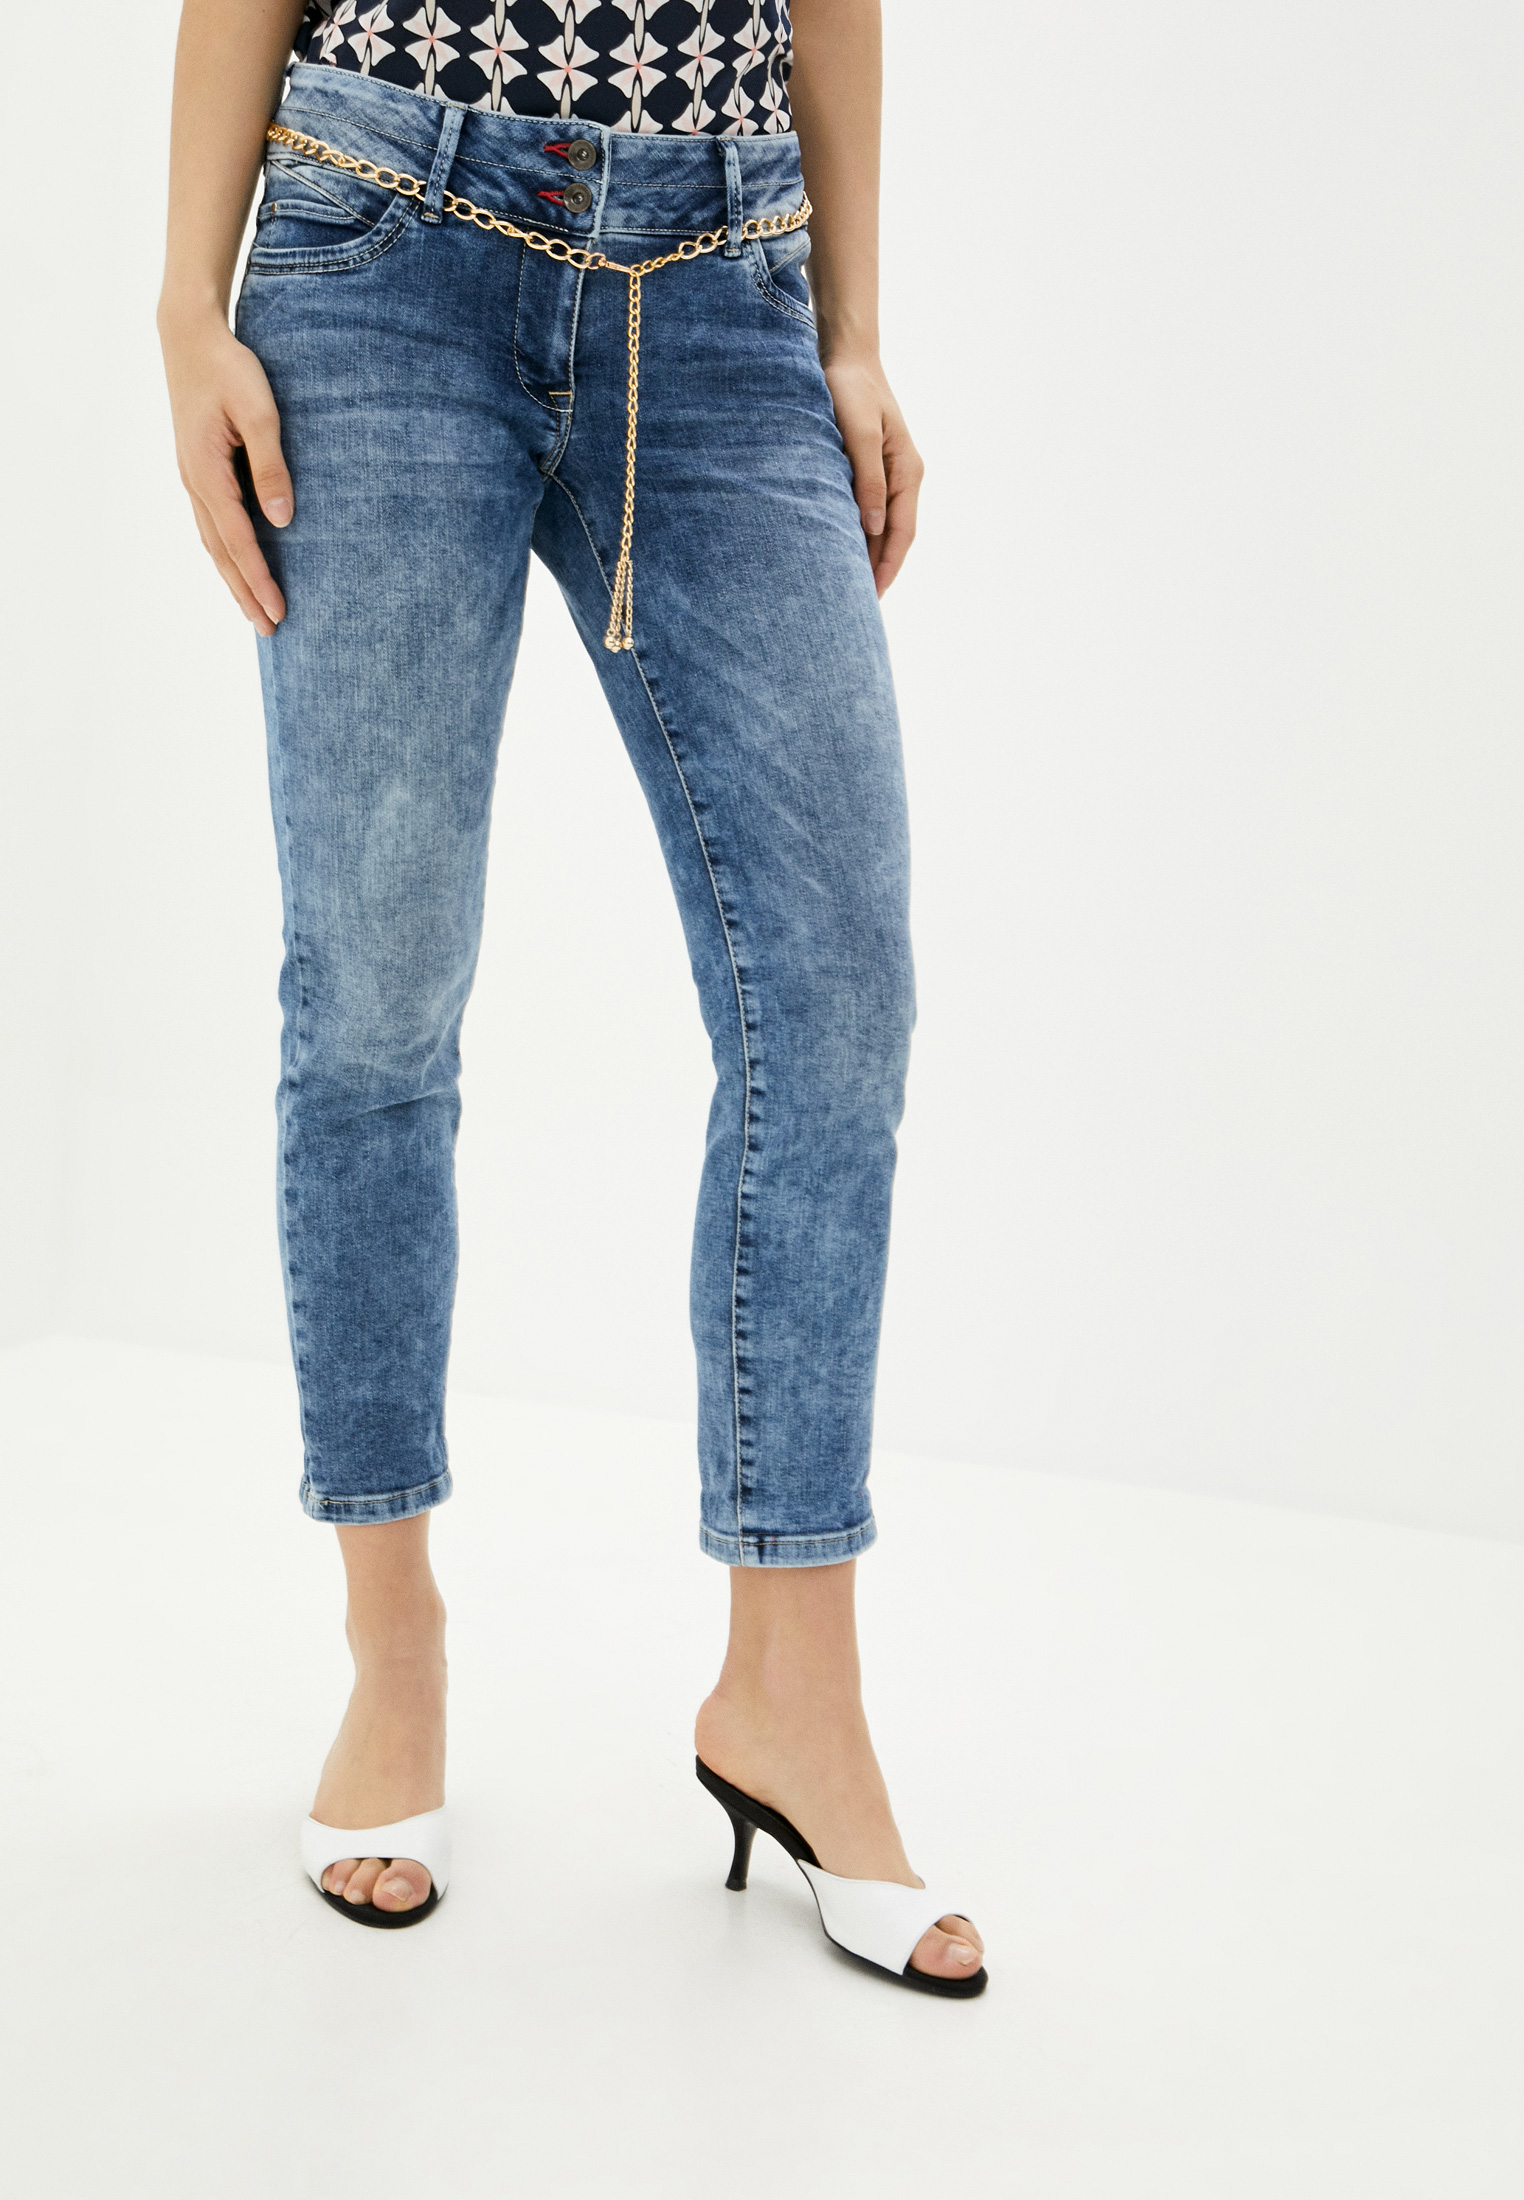 Женские джинсы Betty Barclay 6084/1277